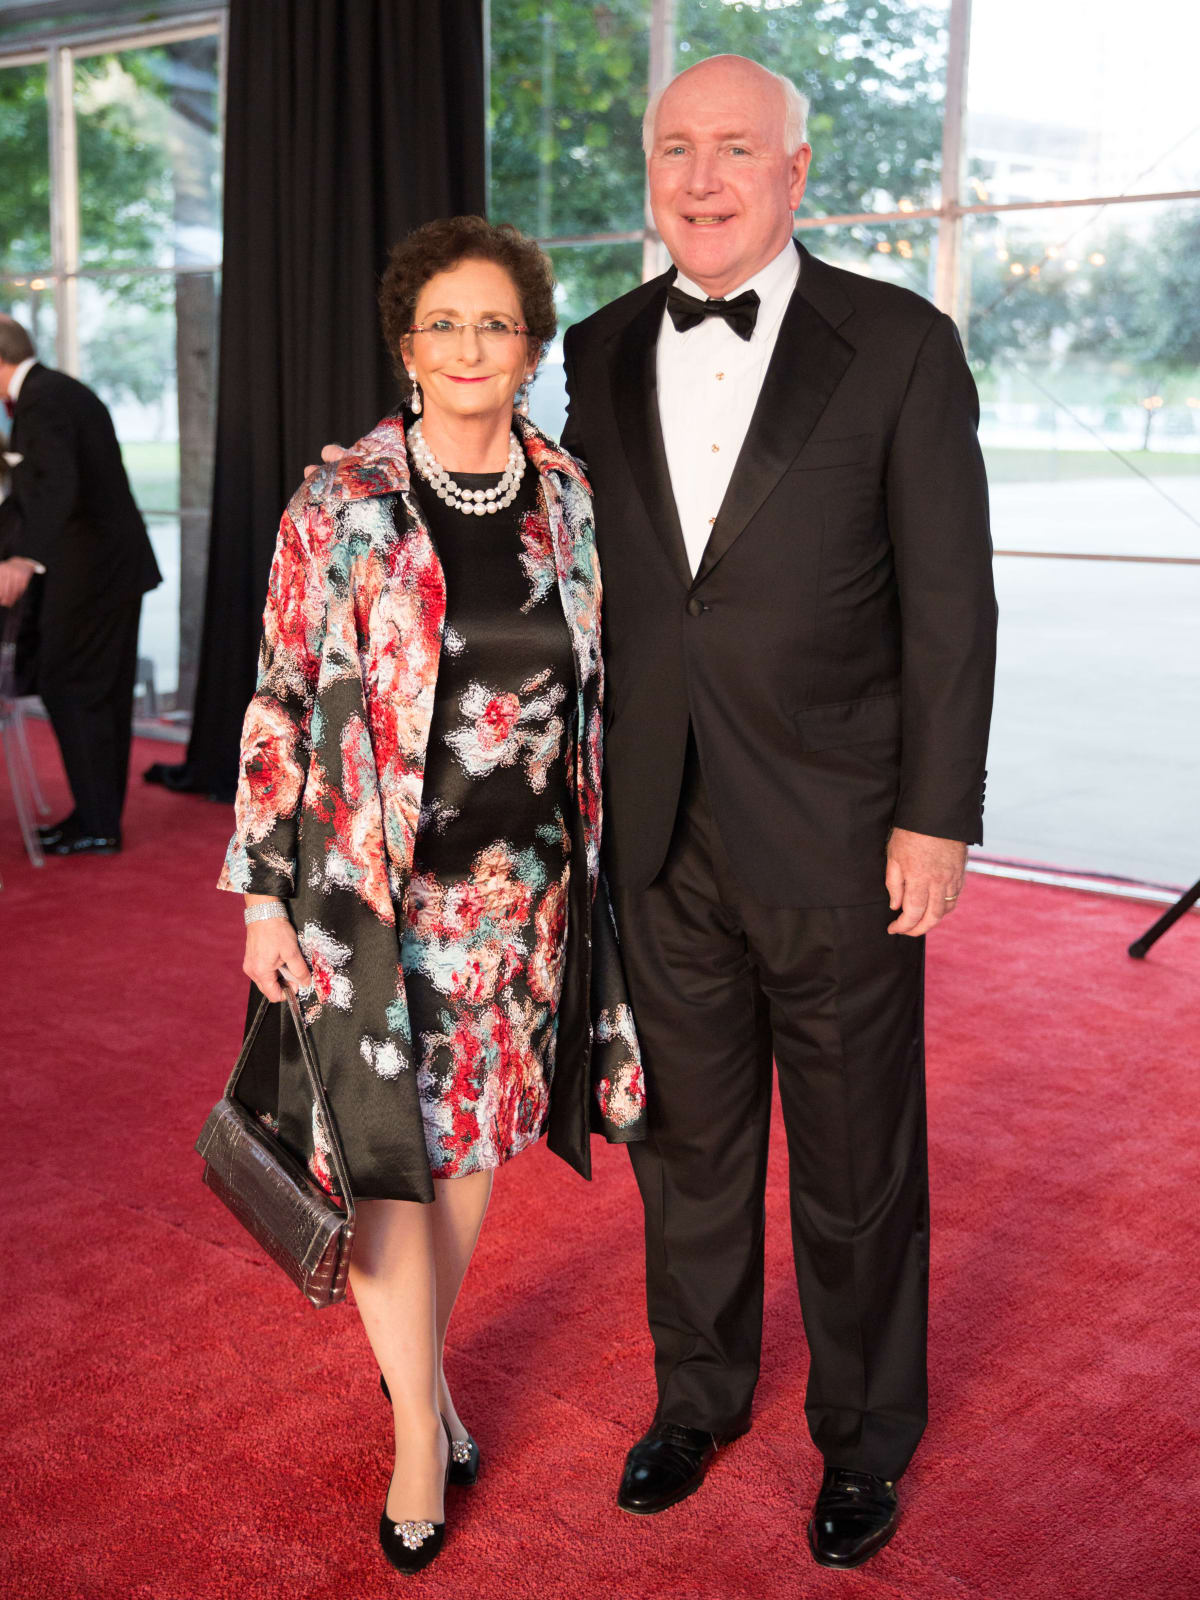 Nancy Nasher, David Haemisegger